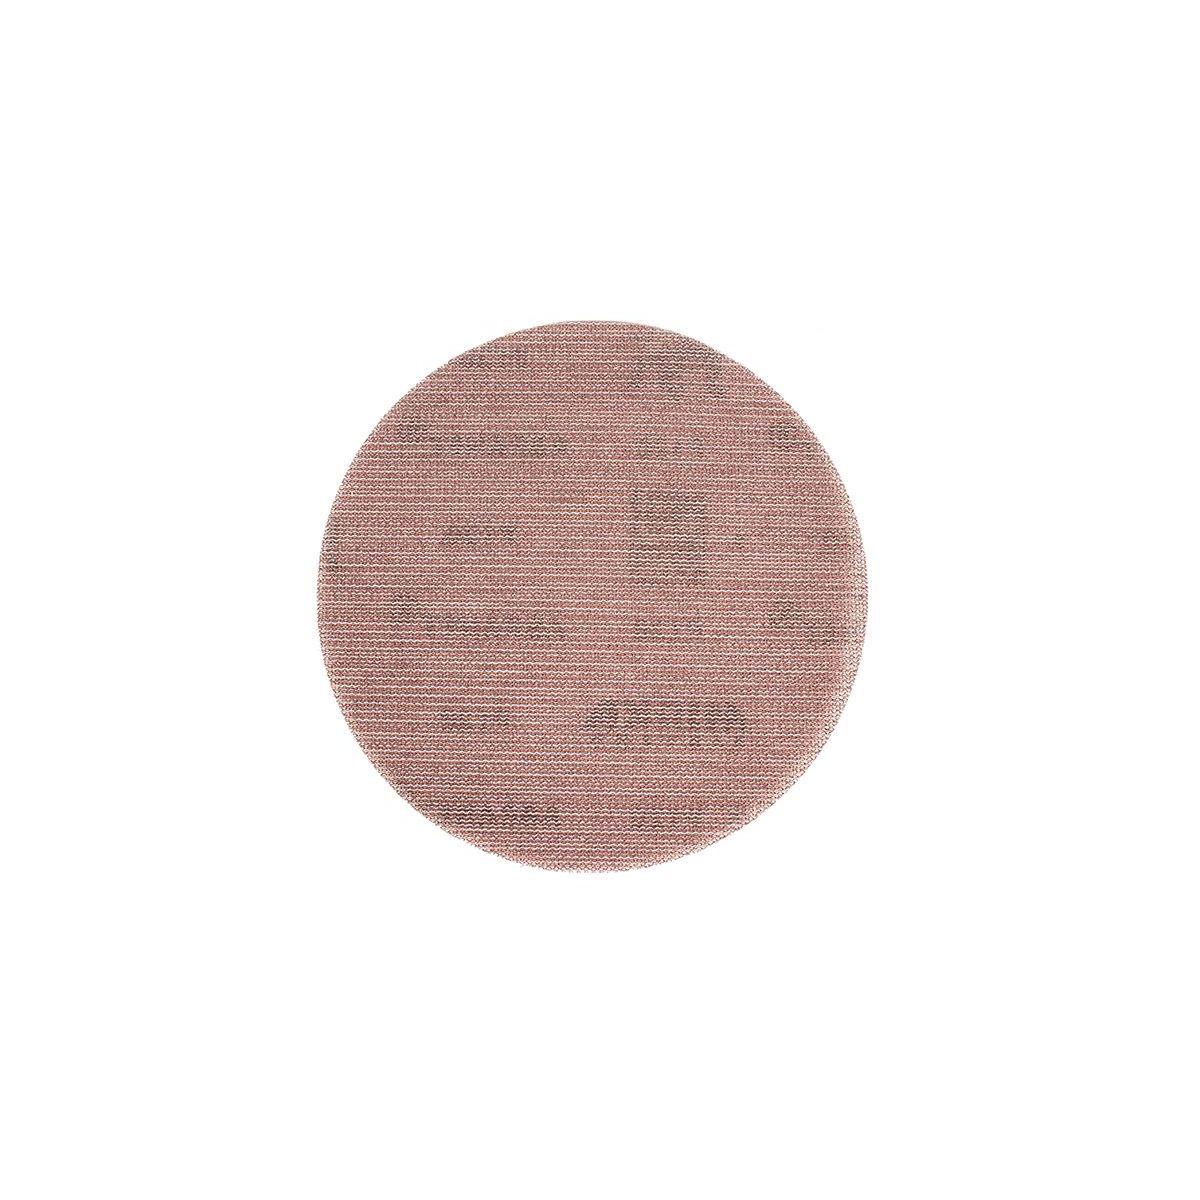 50 x Mirka Abranet Schleifscheibe   77 mm   Korn / Körnung: 120   5420305012